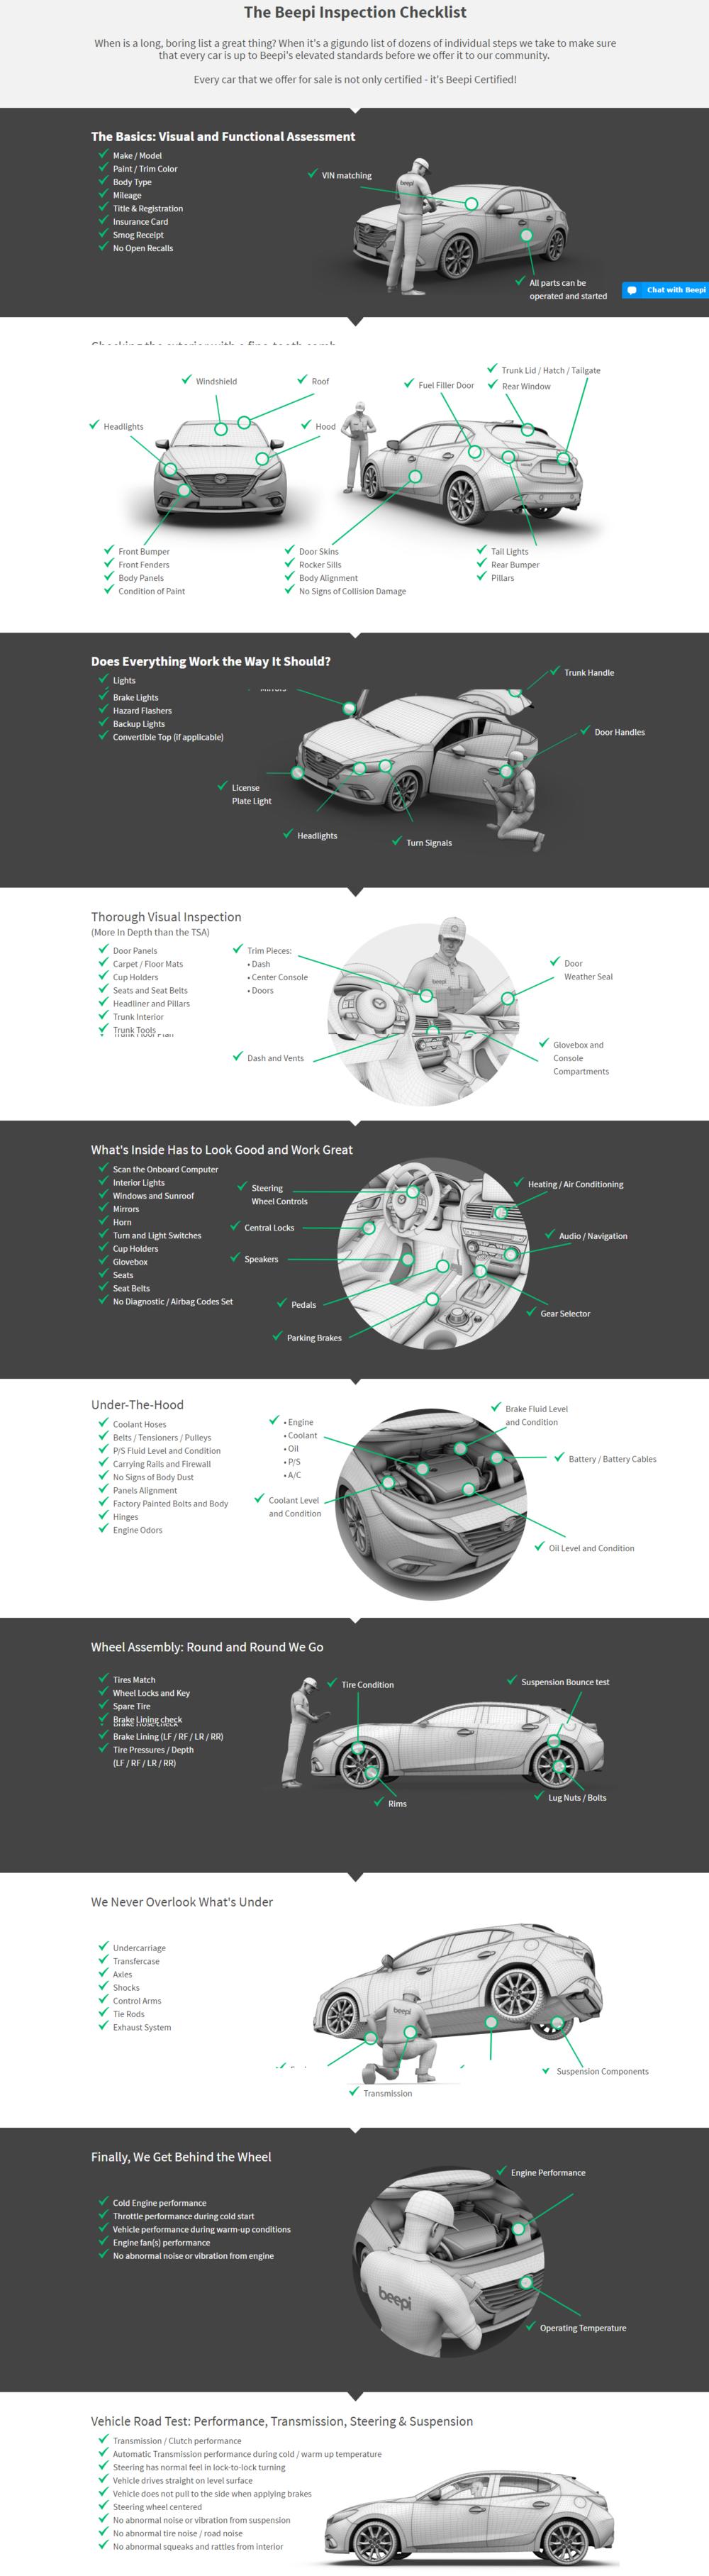 Beepi Inspection Checklist